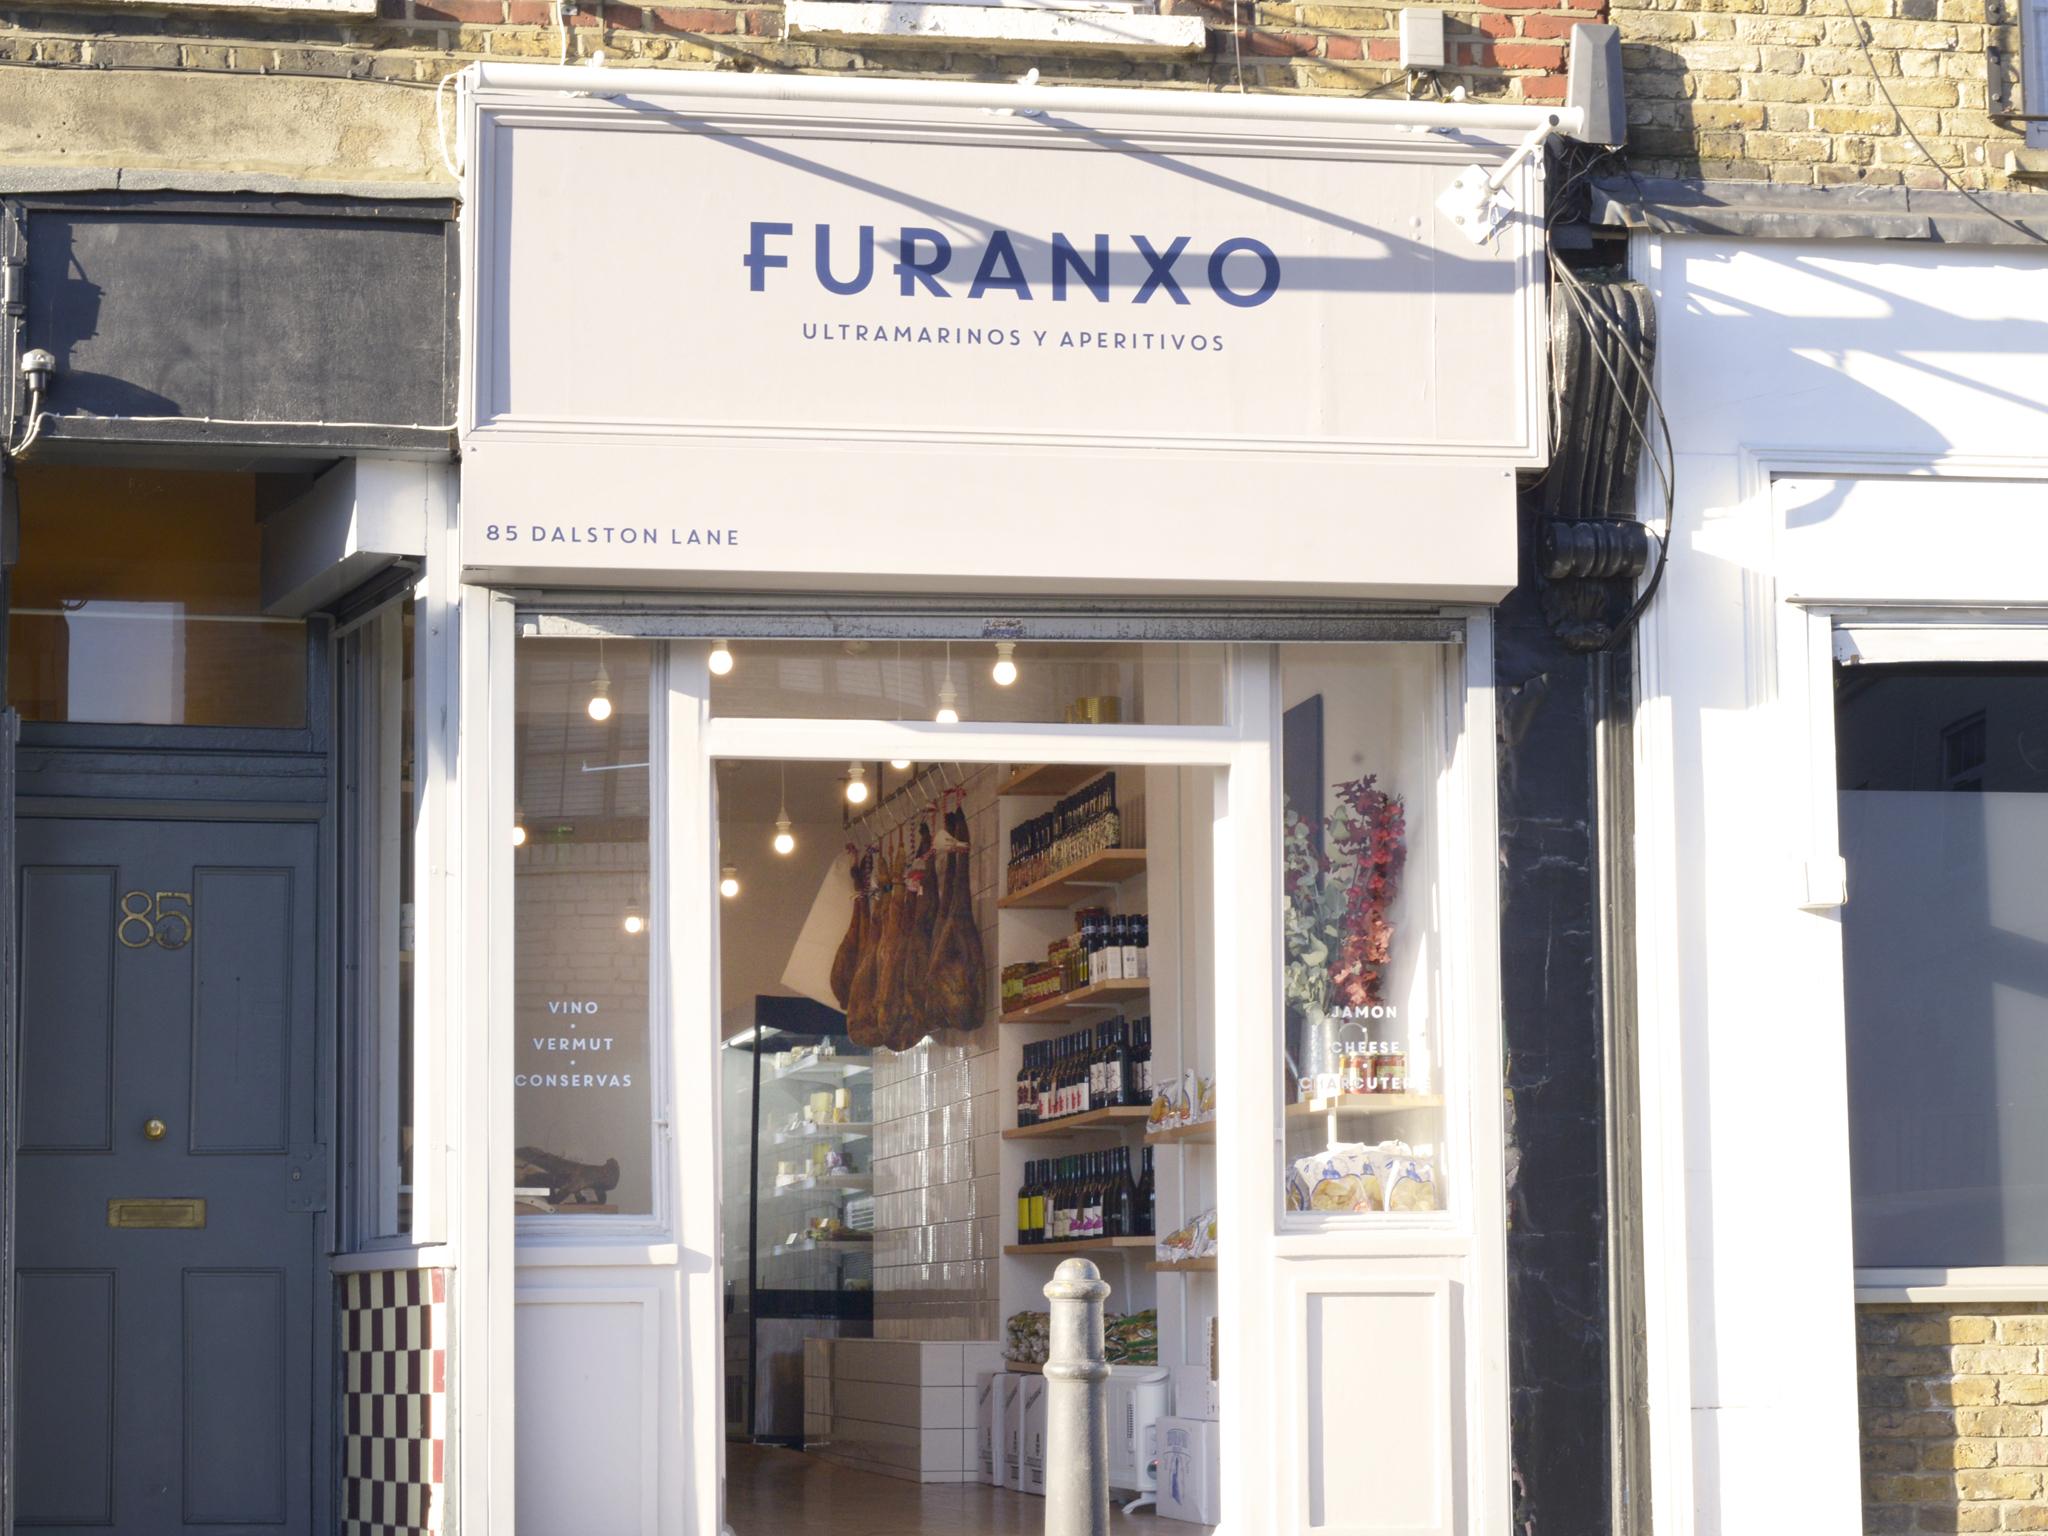 london's best wine bars, furanxo